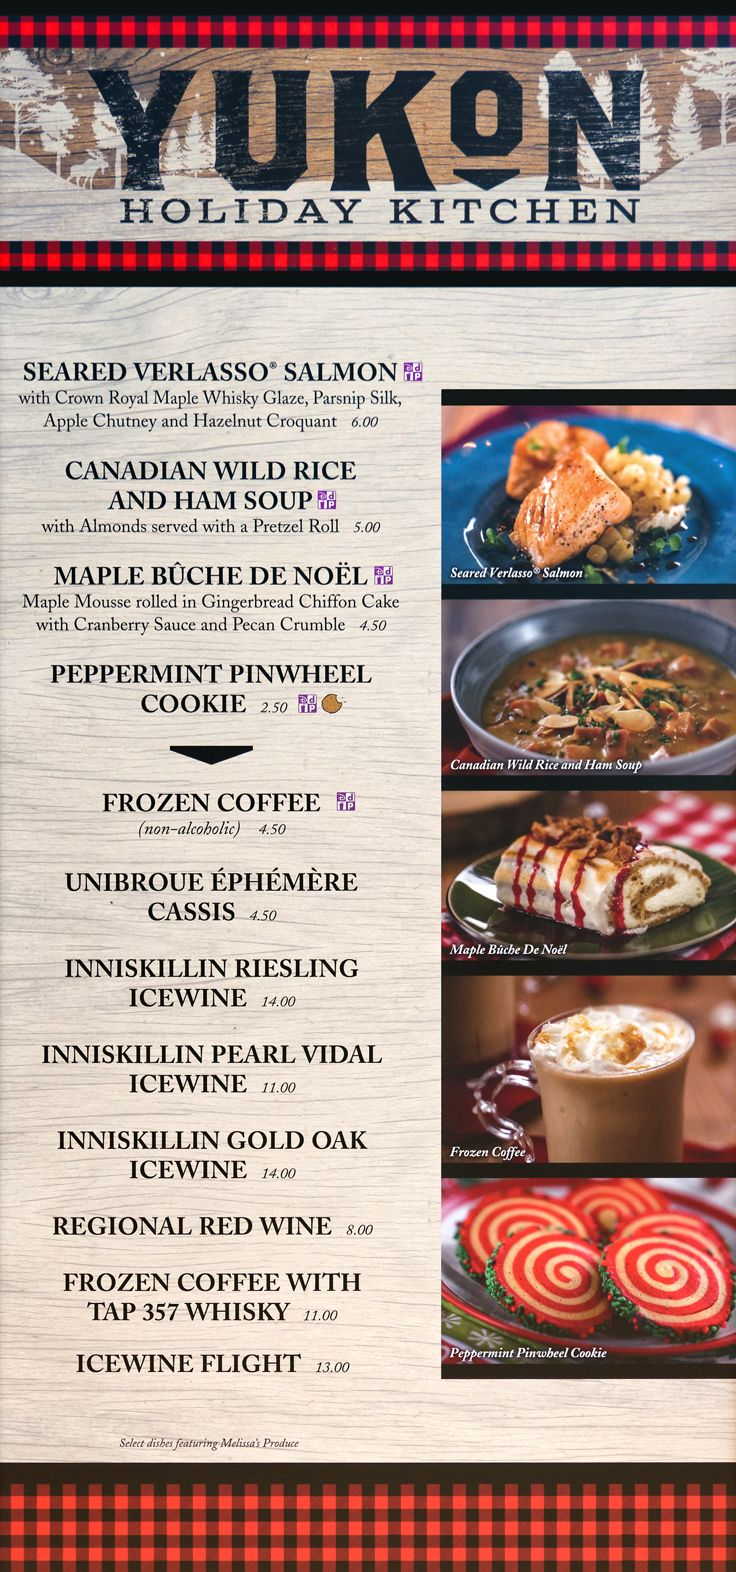 The 2019 Yukon (Canada Pavilion) menu board with prices